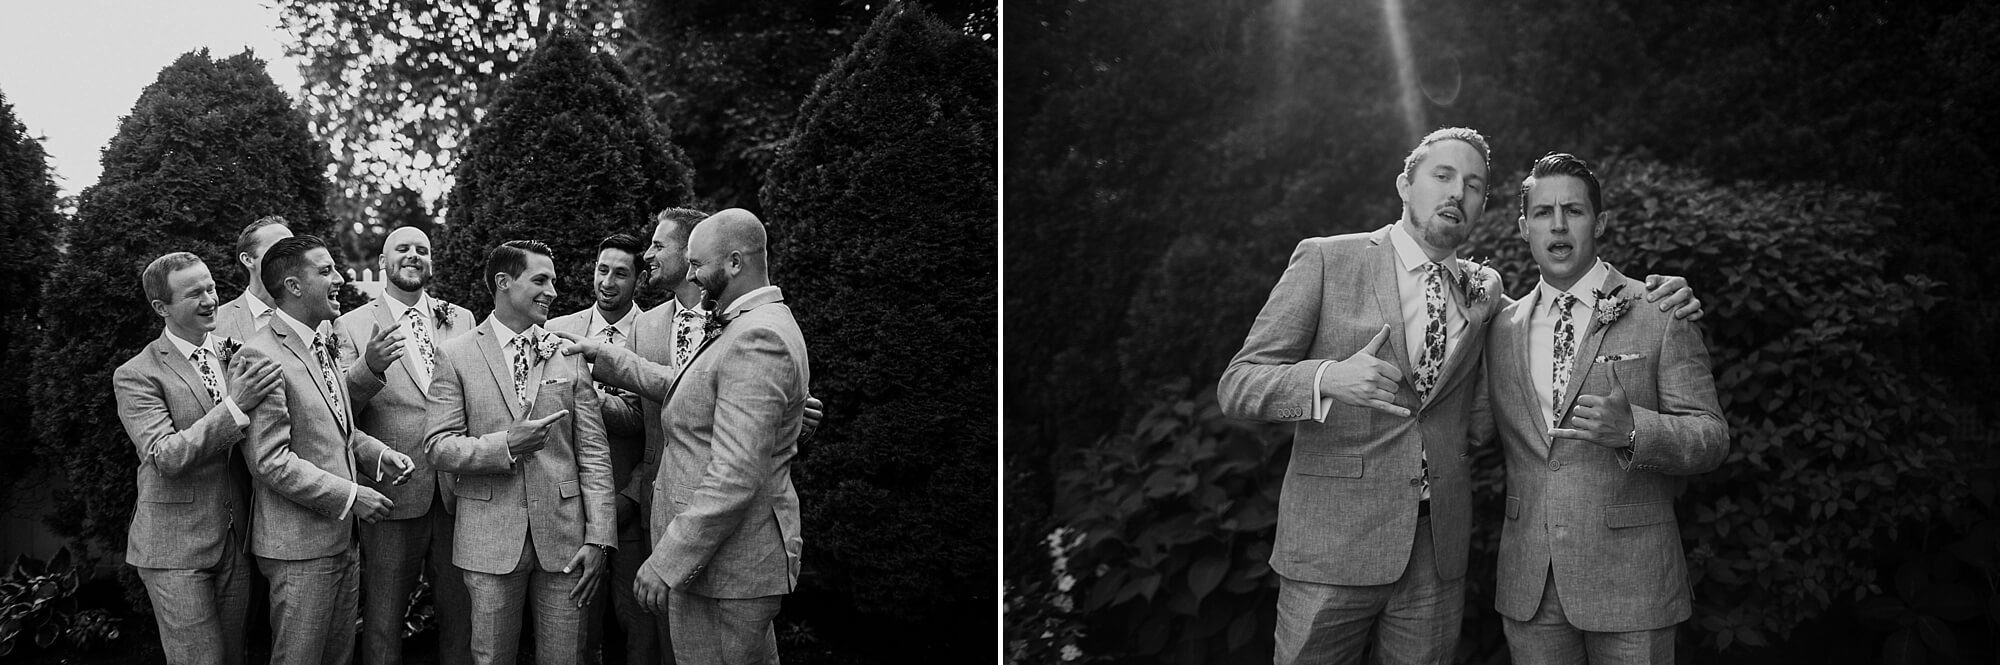 Topsfield Commons Wedding-19.jpg